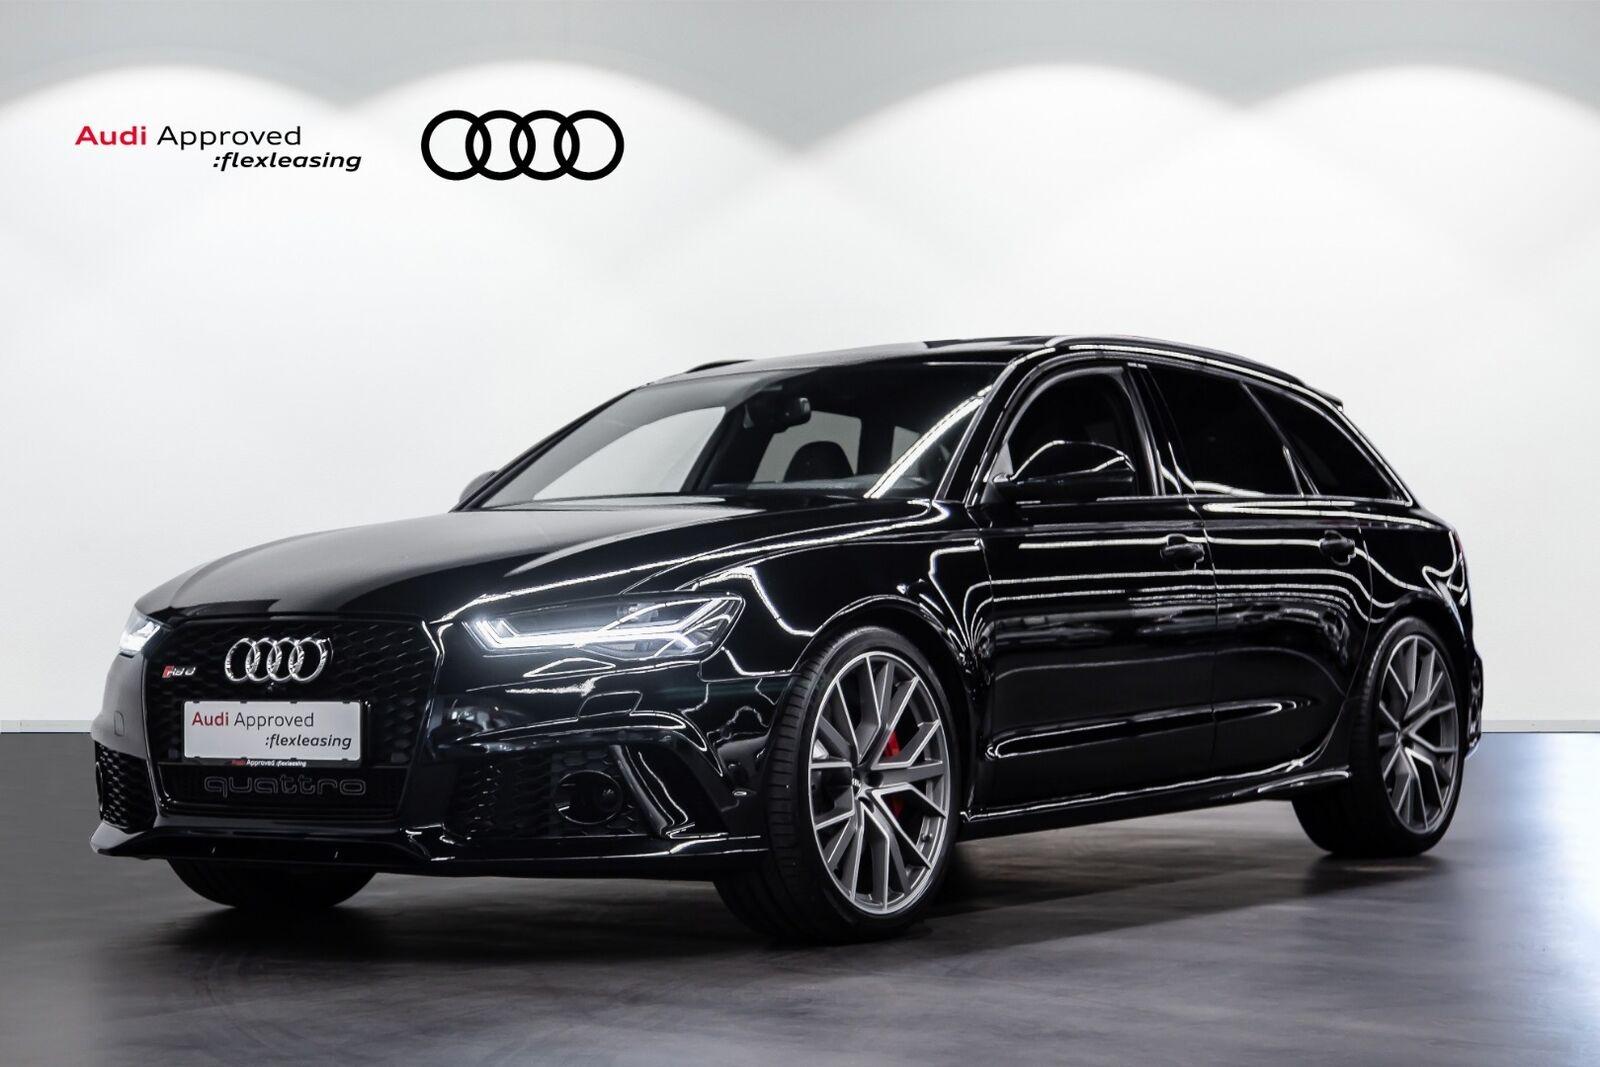 Audi RS6 4,0 TFSi performance Avant quattro 5d - 7.699 kr.